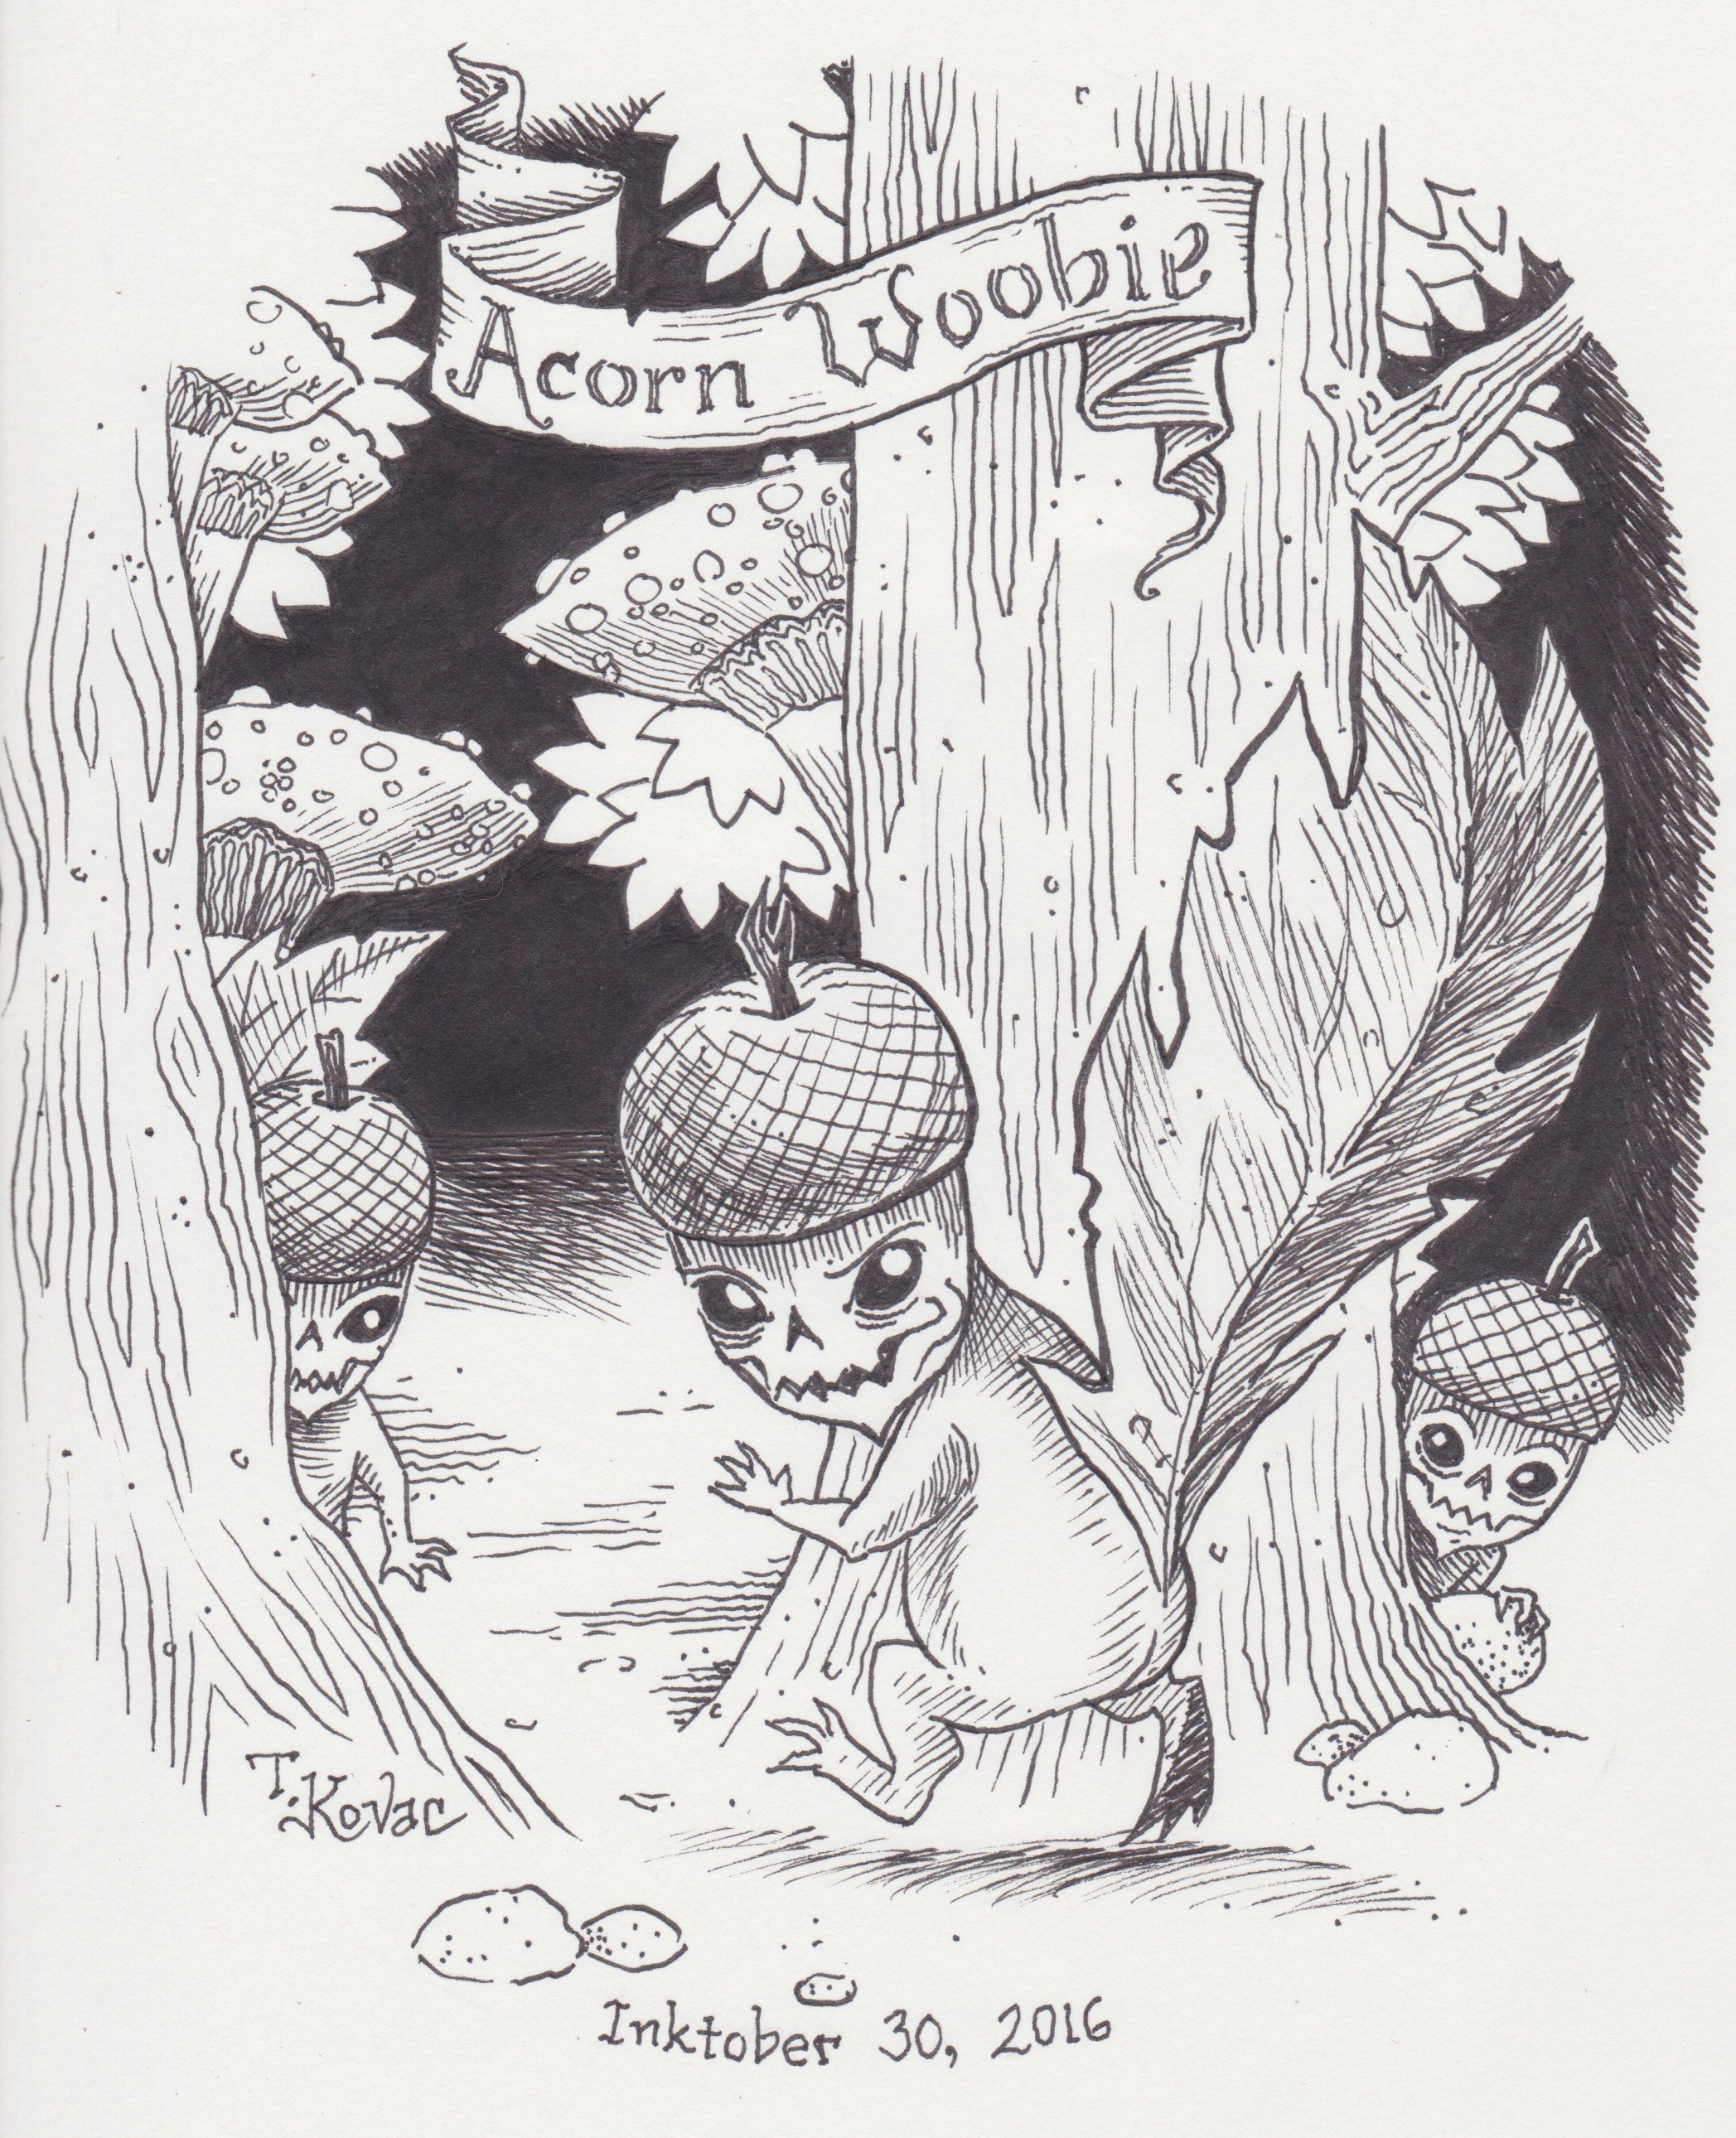 Acorn Woobie